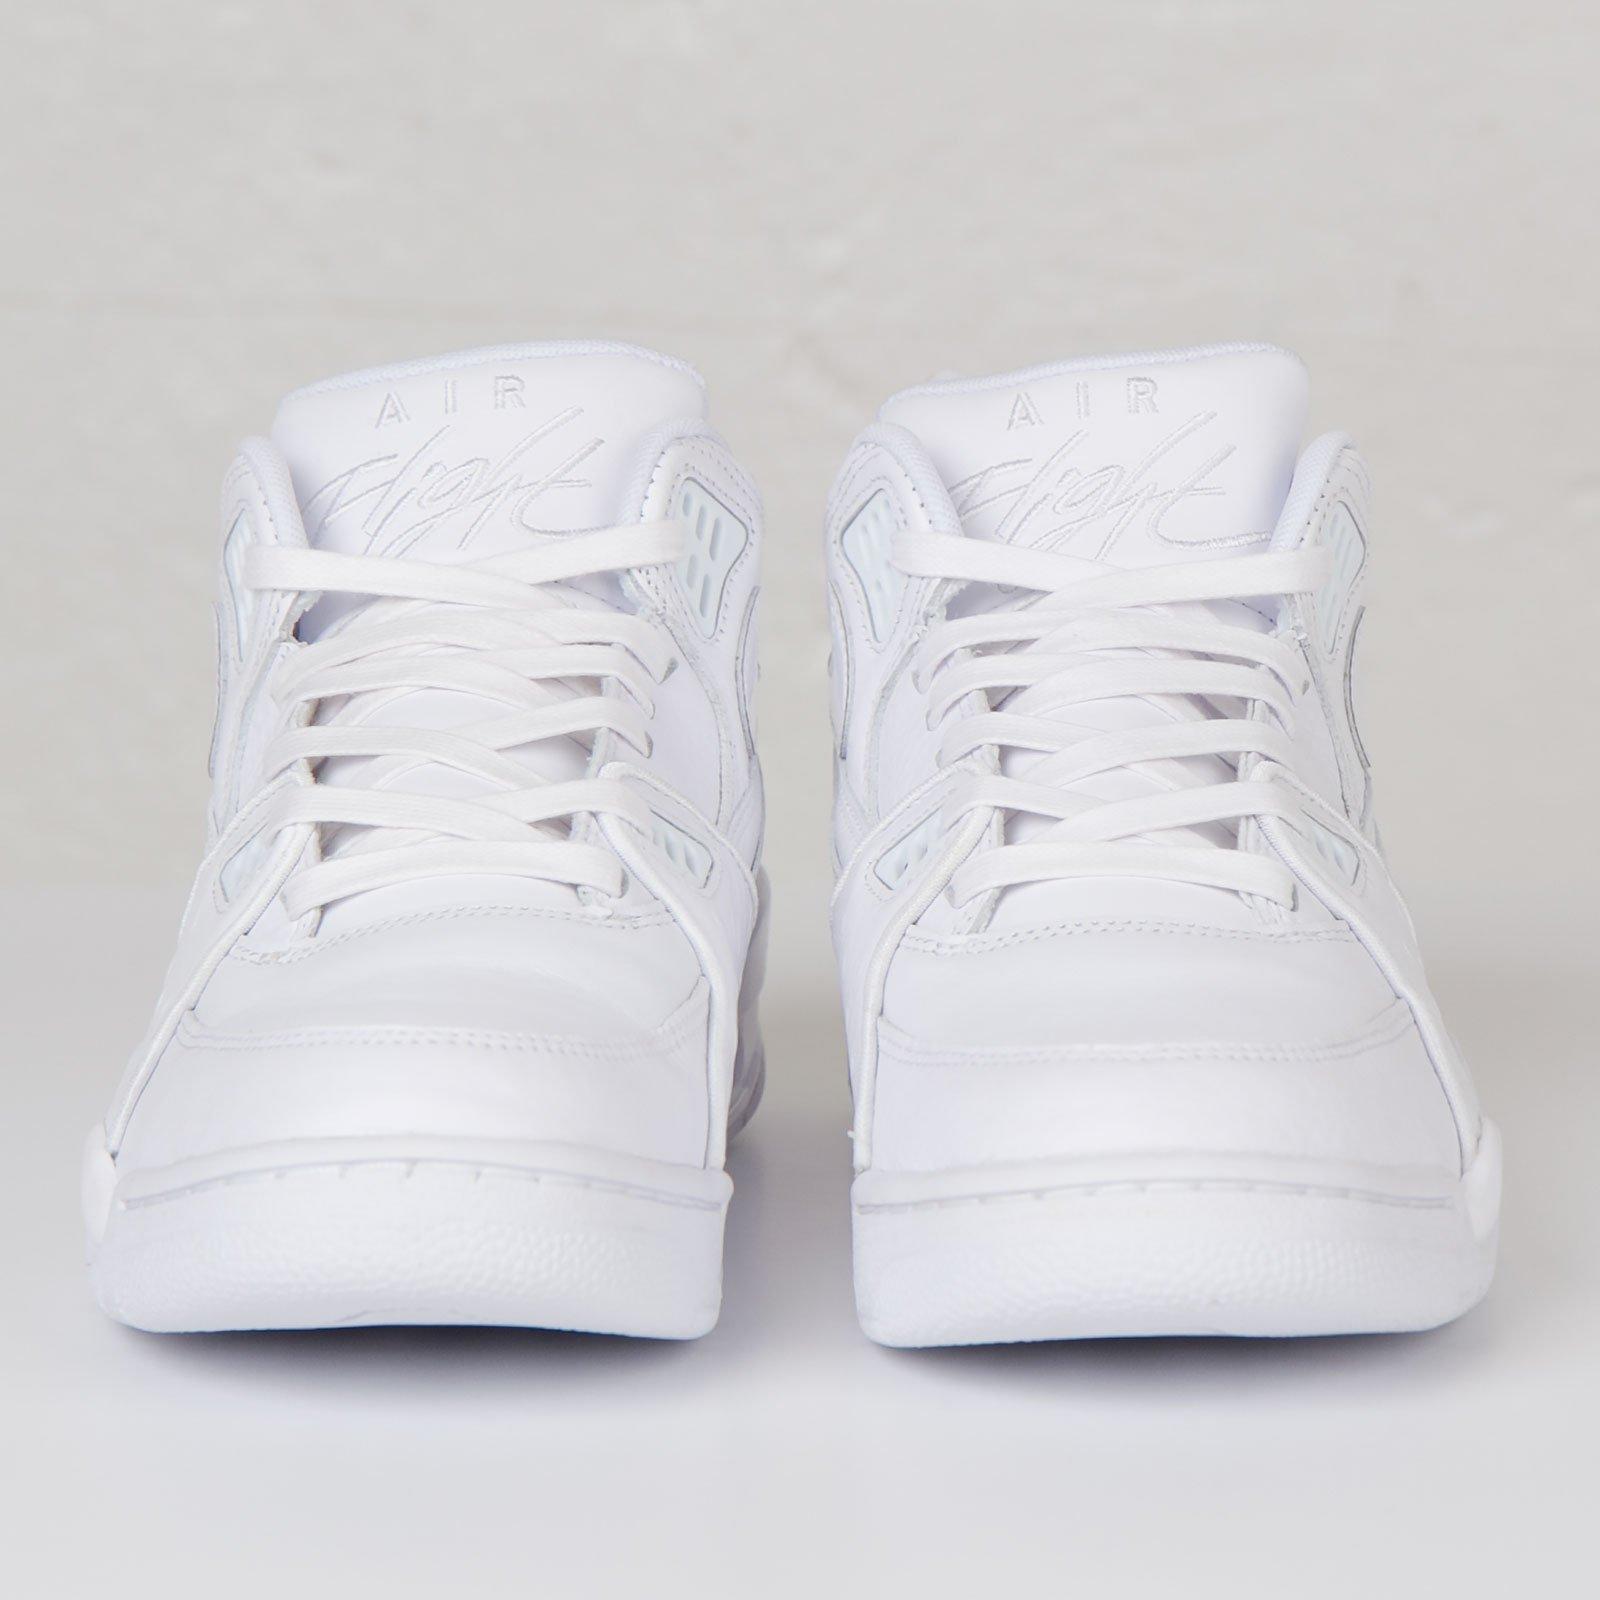 Están familiarizados Dinkarville Año  Nike Air Flight 89 LE QS - 804605-100 - Sneakersnstuff | sneakers &  streetwear online since 1999